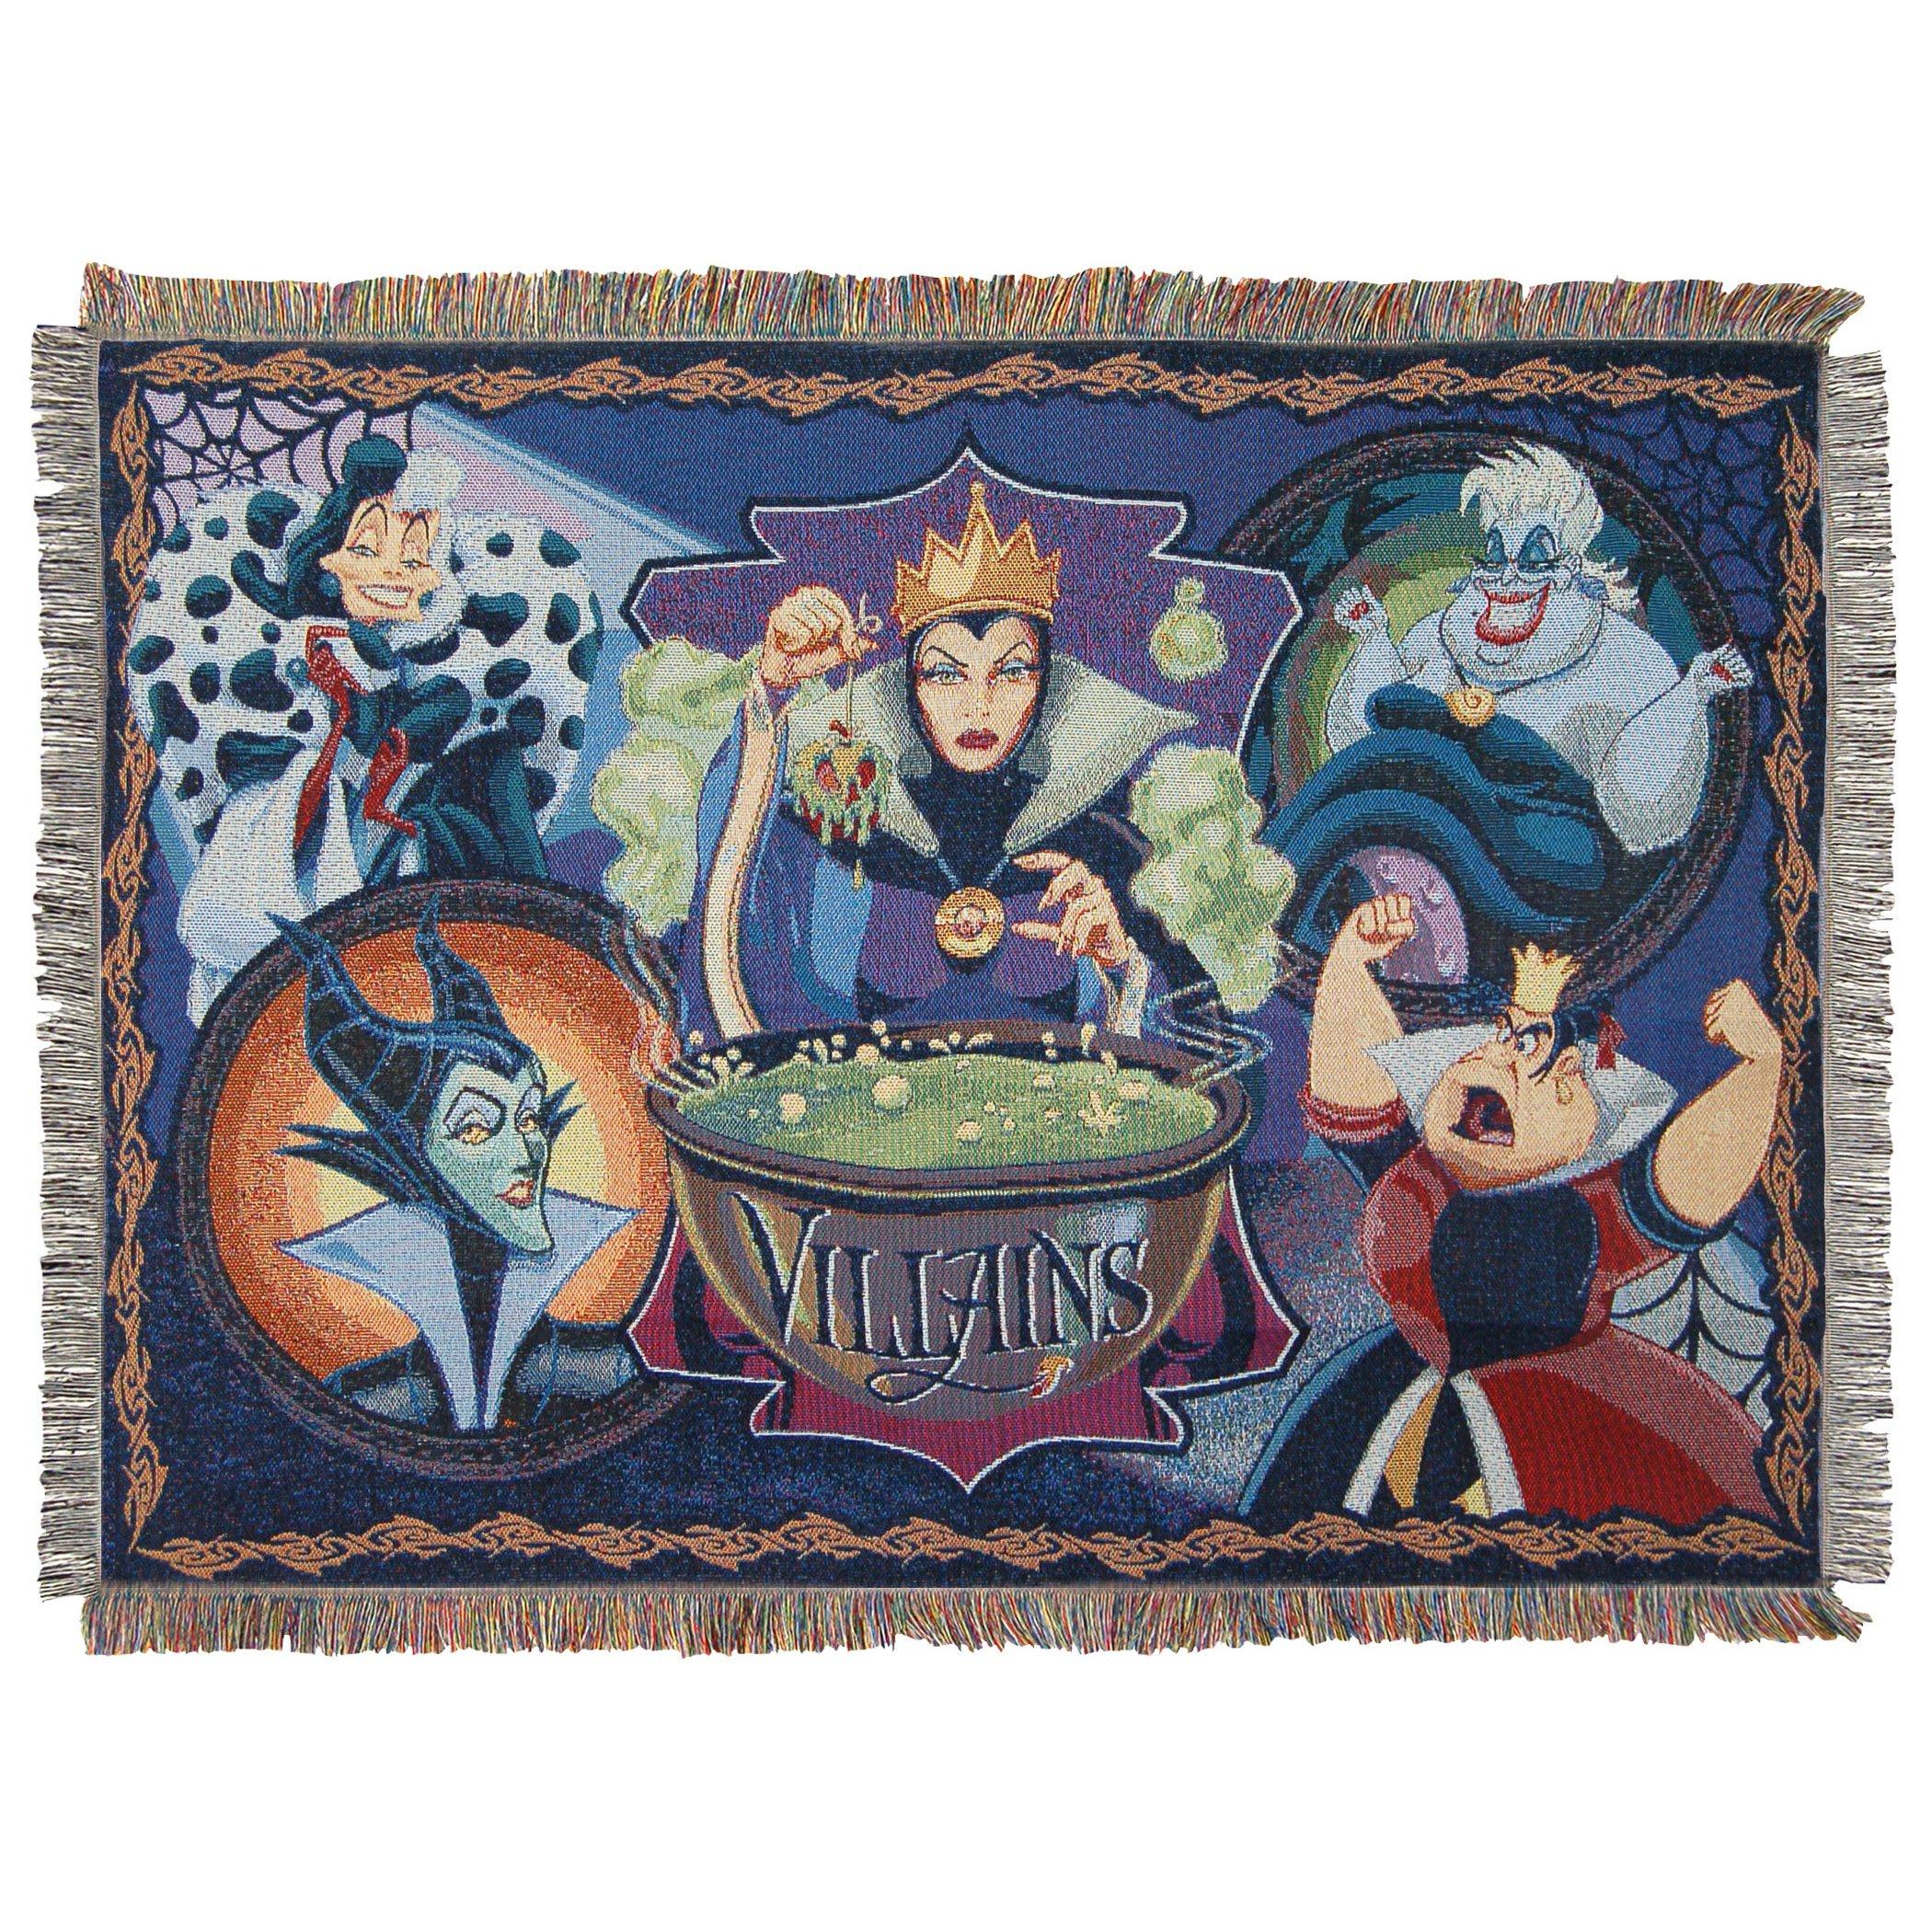 Disney Villains Throw Blanket, 48 x 60 inch, Multicolor